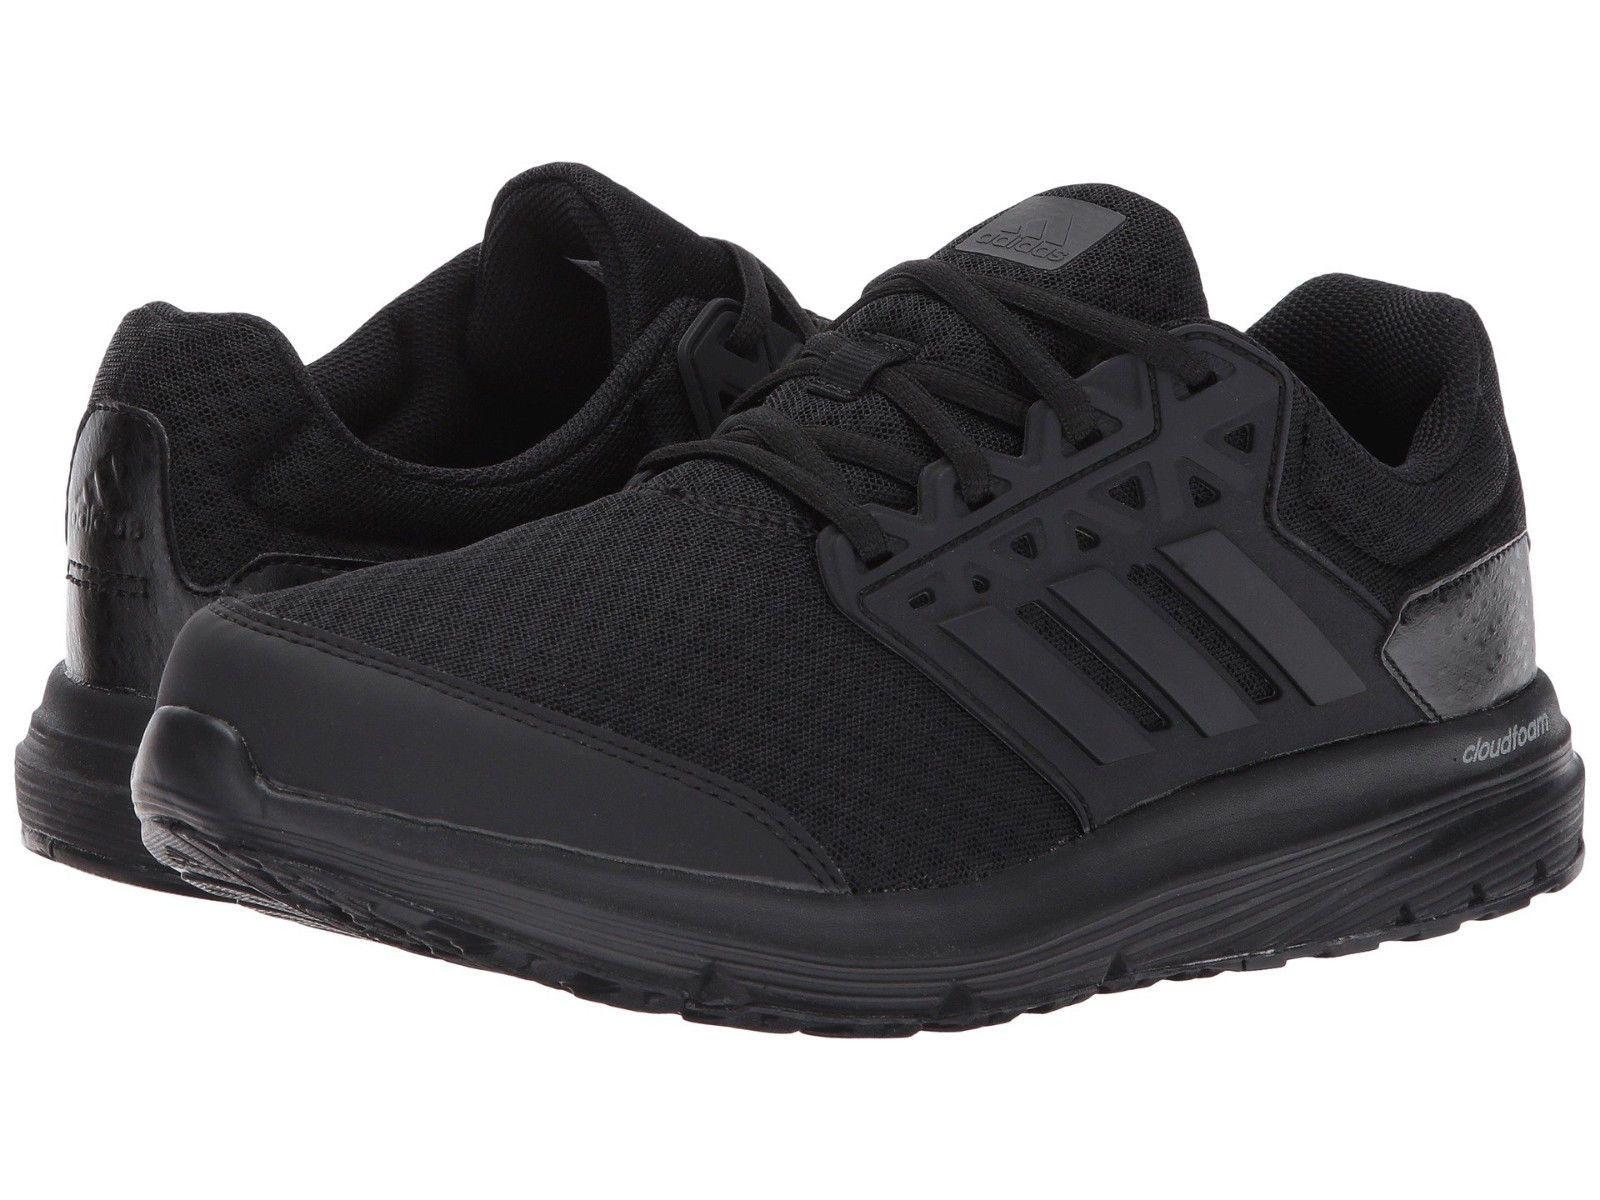 Mens Adidas Galaxy 3 M Black Sport